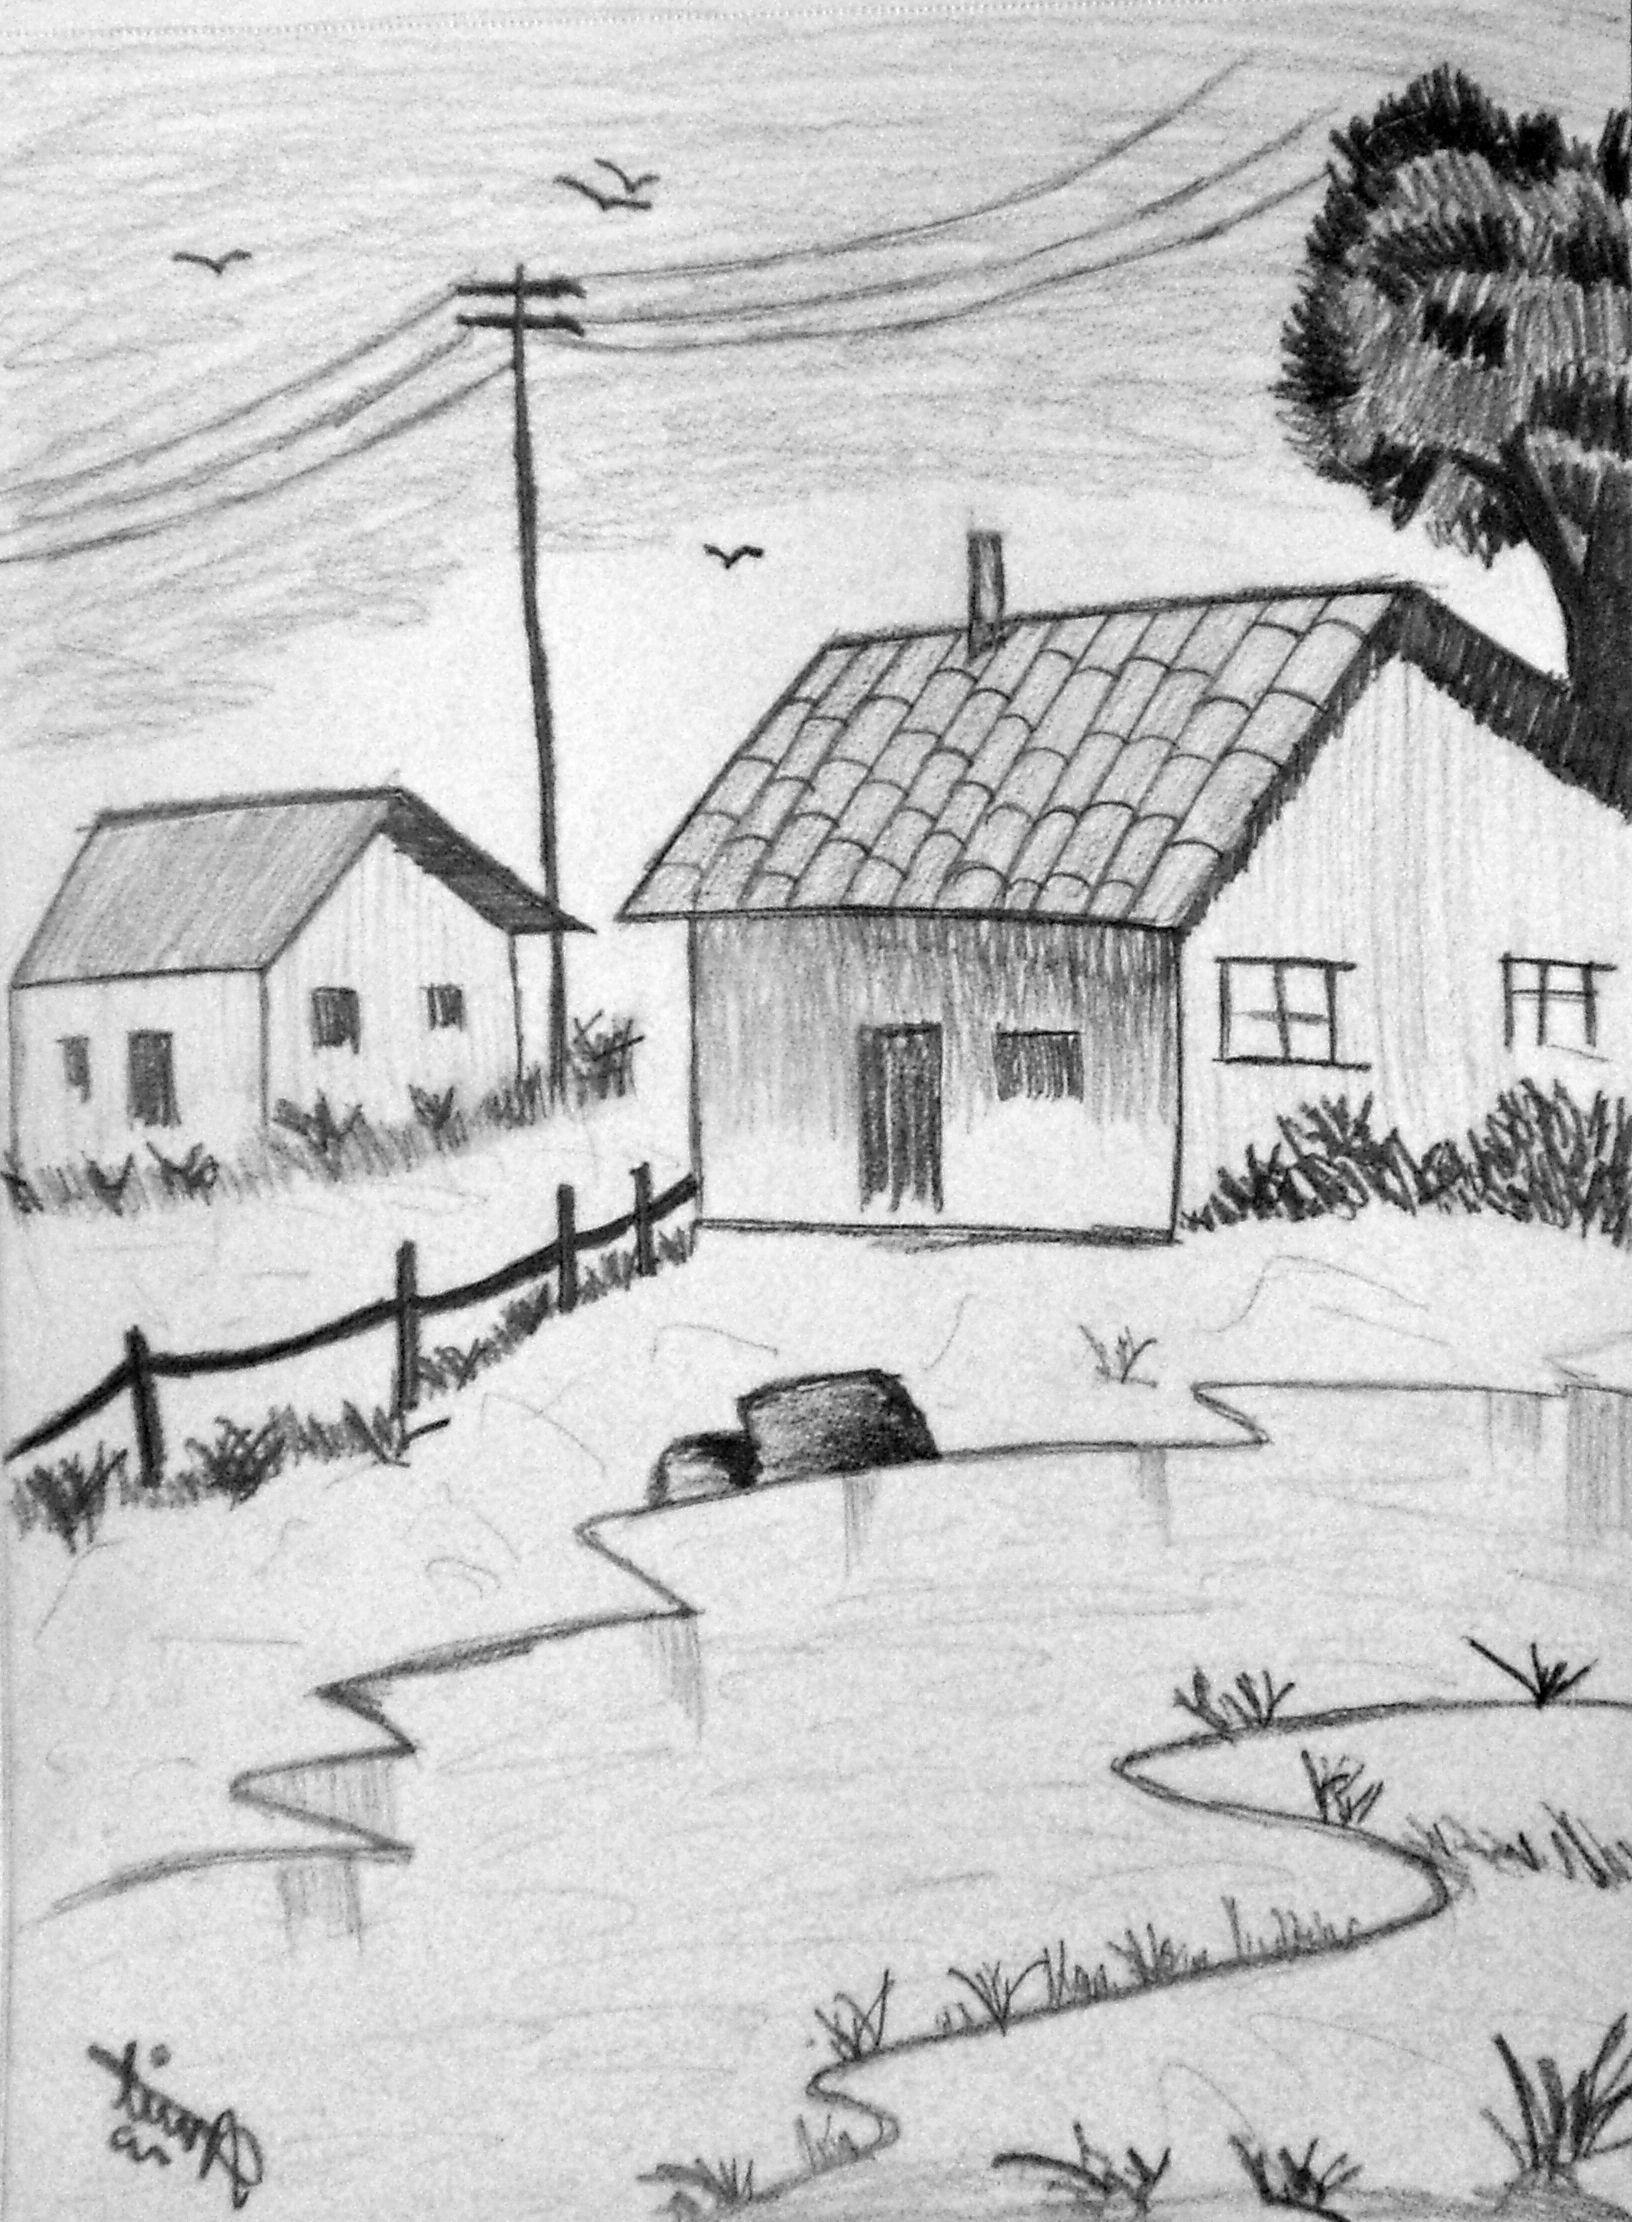 Landscape Pencil Drawing Easy Hd Pencil Drawing Scenery Landscapes Drawing Scenery Easy Nature Drawings Landscape Pencil Drawings